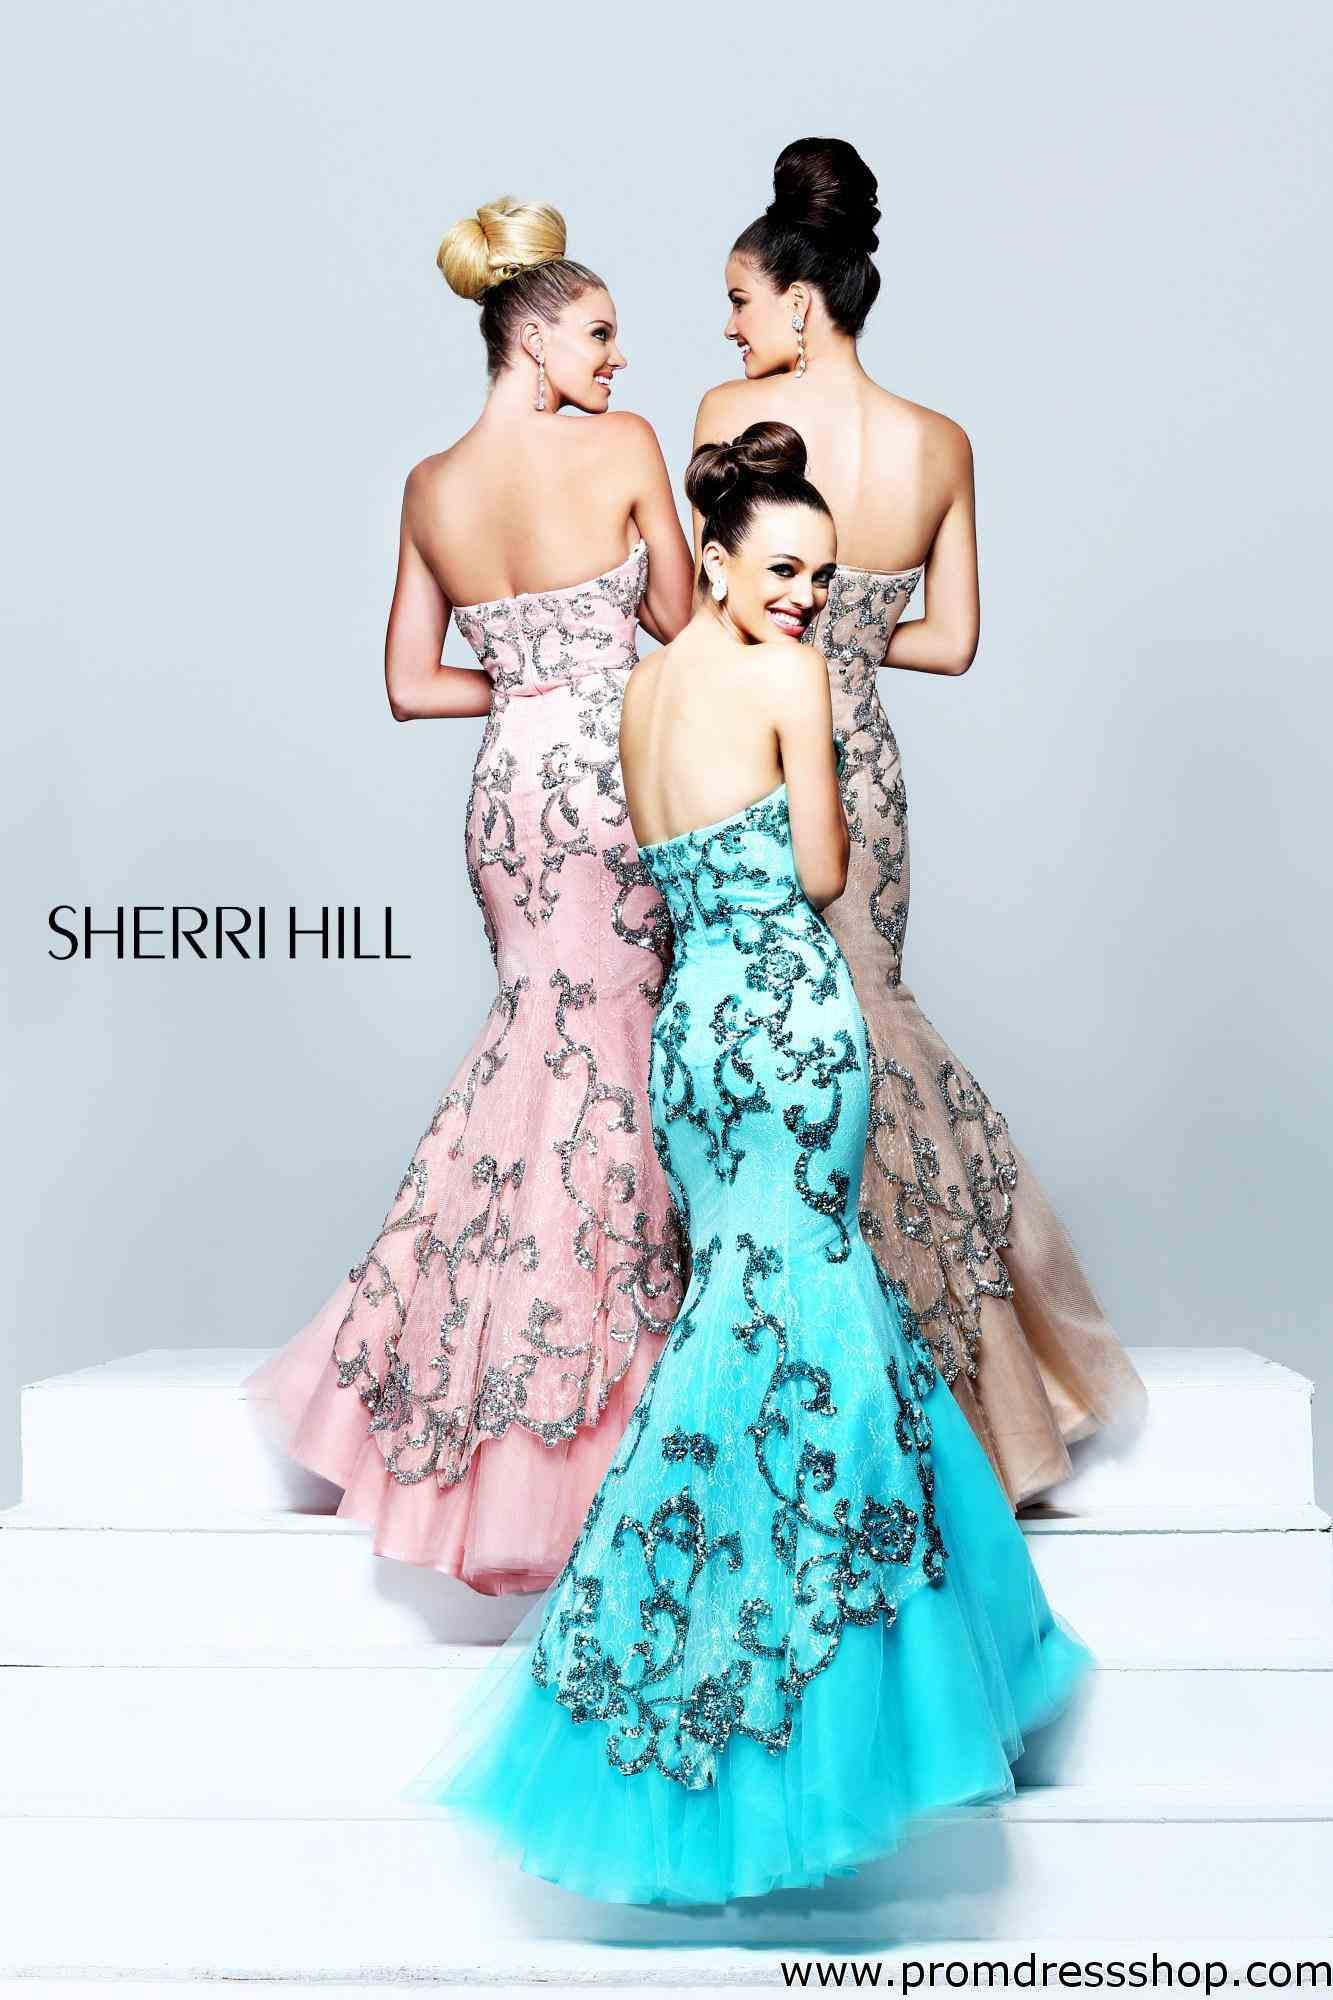 Comfortable Prom Dresses In Nashville Tn Contemporary - Wedding ...